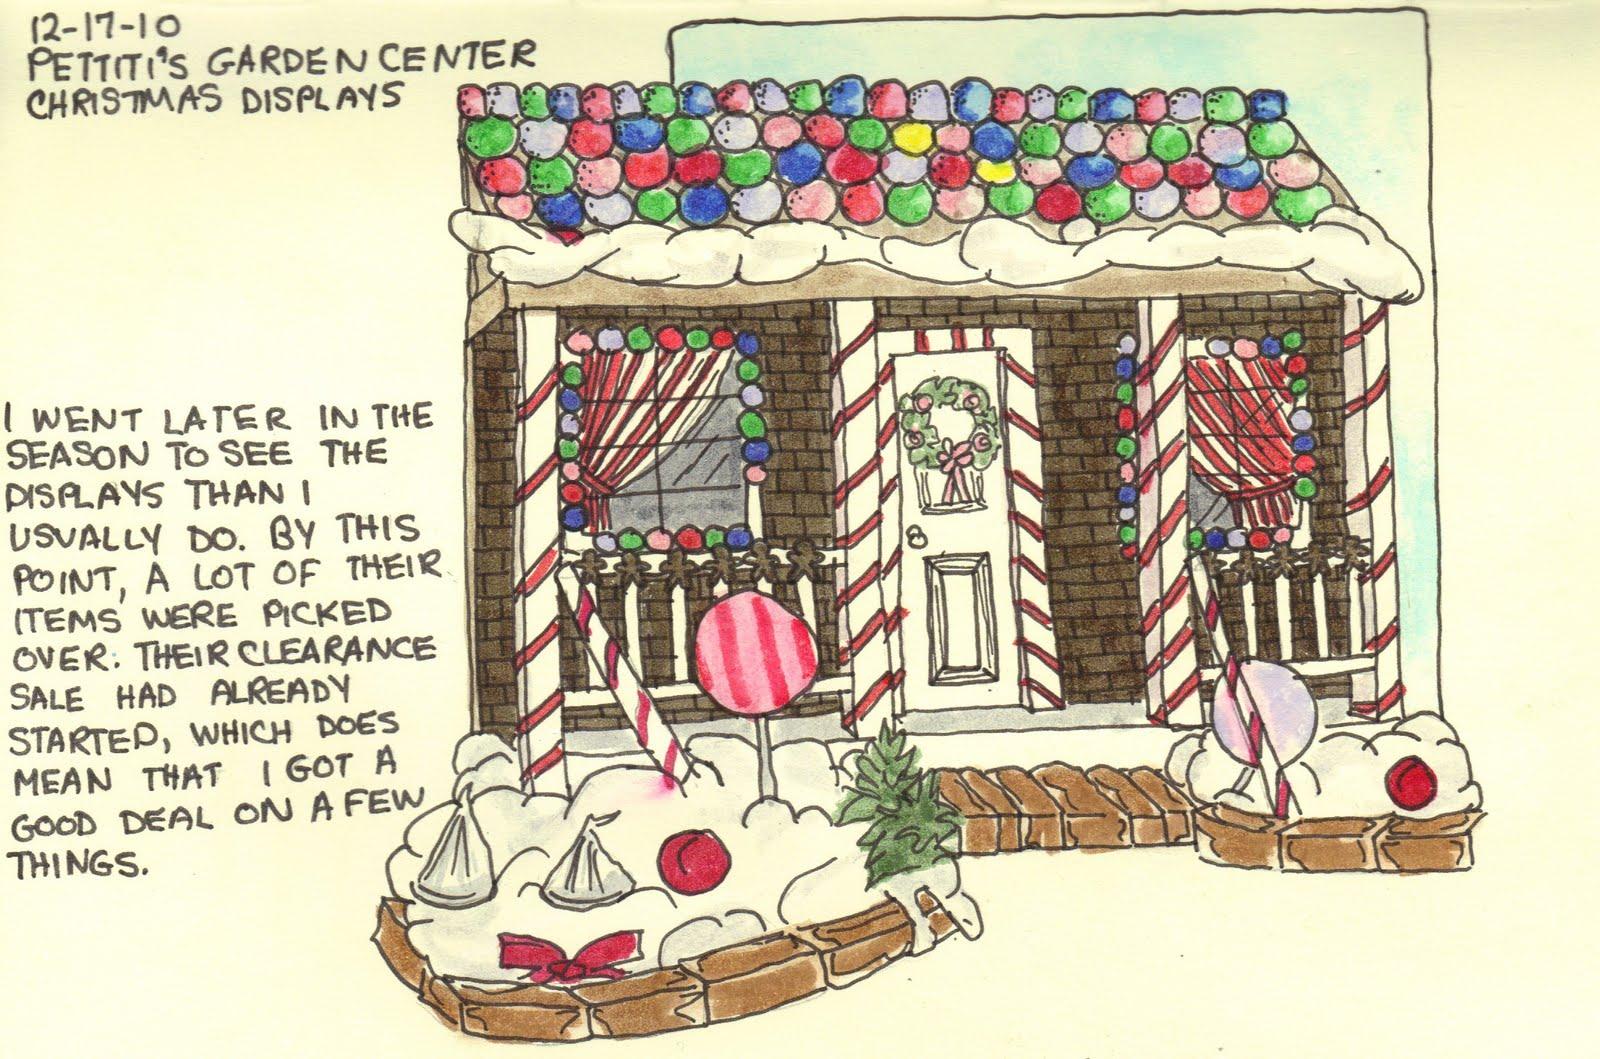 Lost in wonder petitti 39 s garden center - Petitti garden center strongsville ...